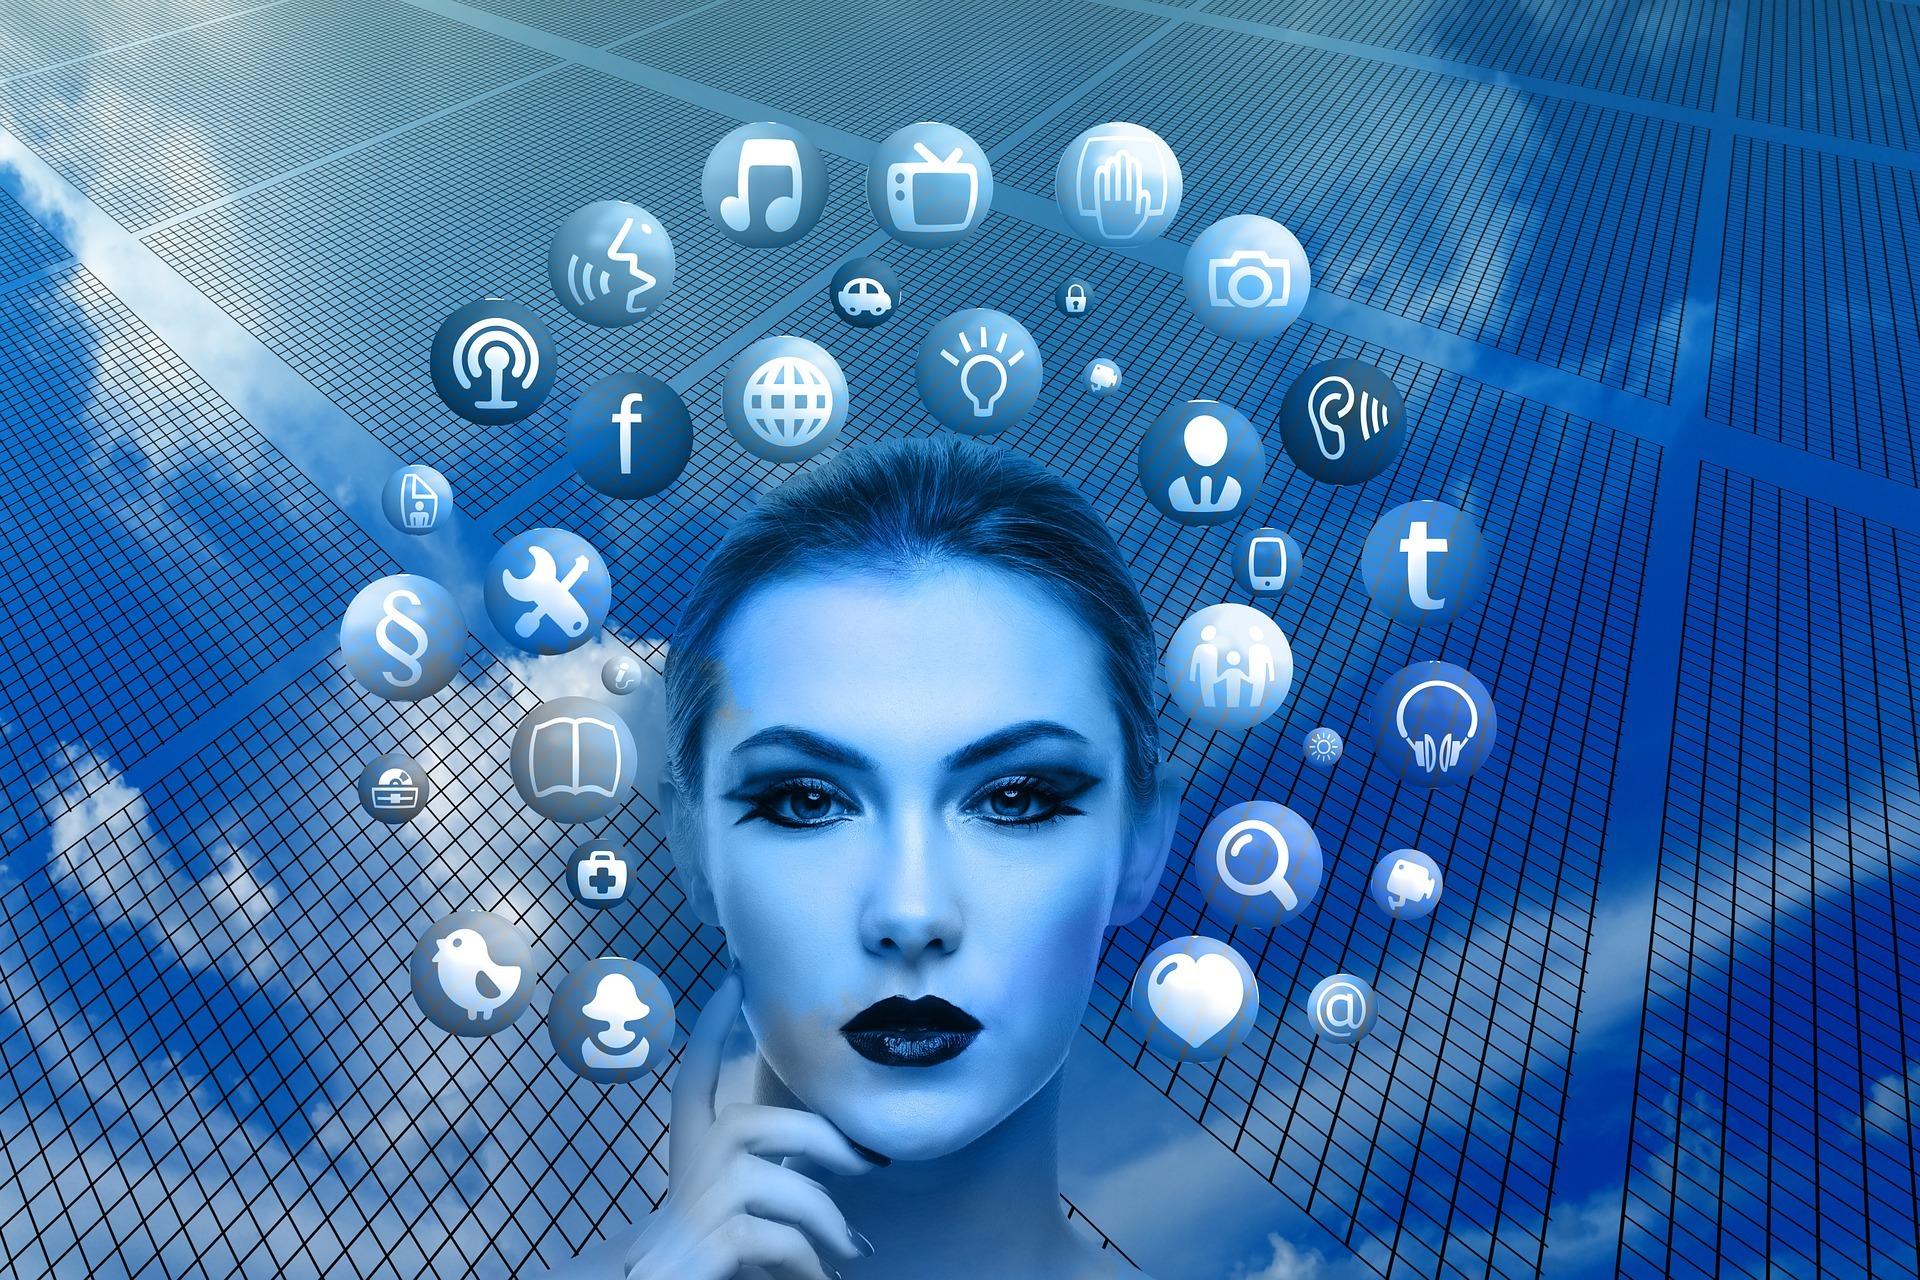 IoT 科技新亮點,「螢幕下指紋辨識延伸感測功能」獲獎